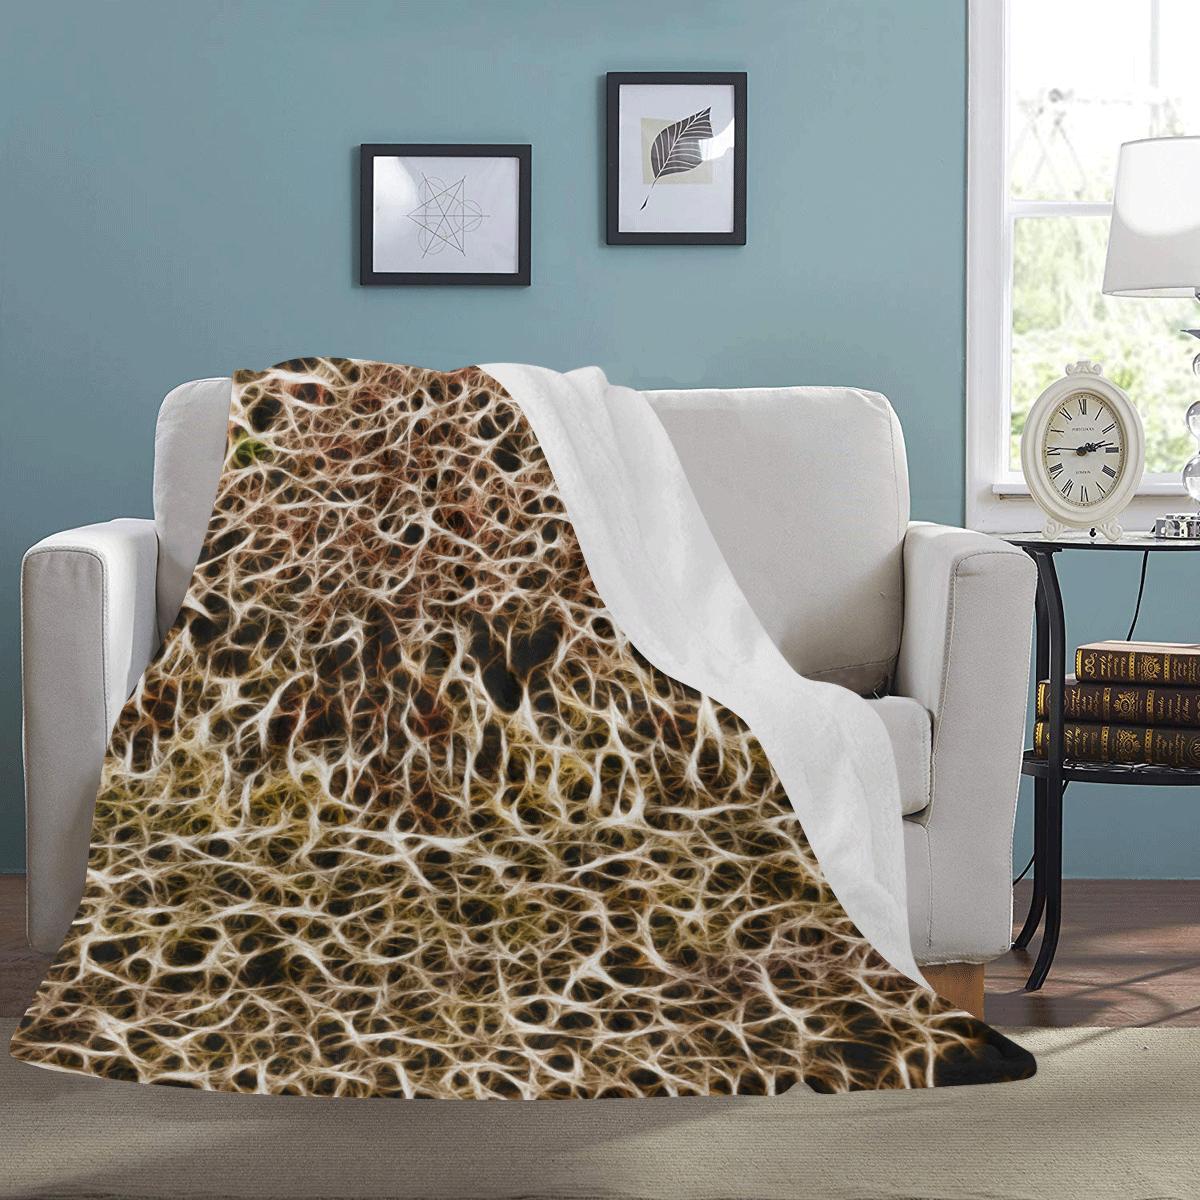 "Misty Fur Coral - Jera Nour Ultra-Soft Micro Fleece Blanket 60""x80"""